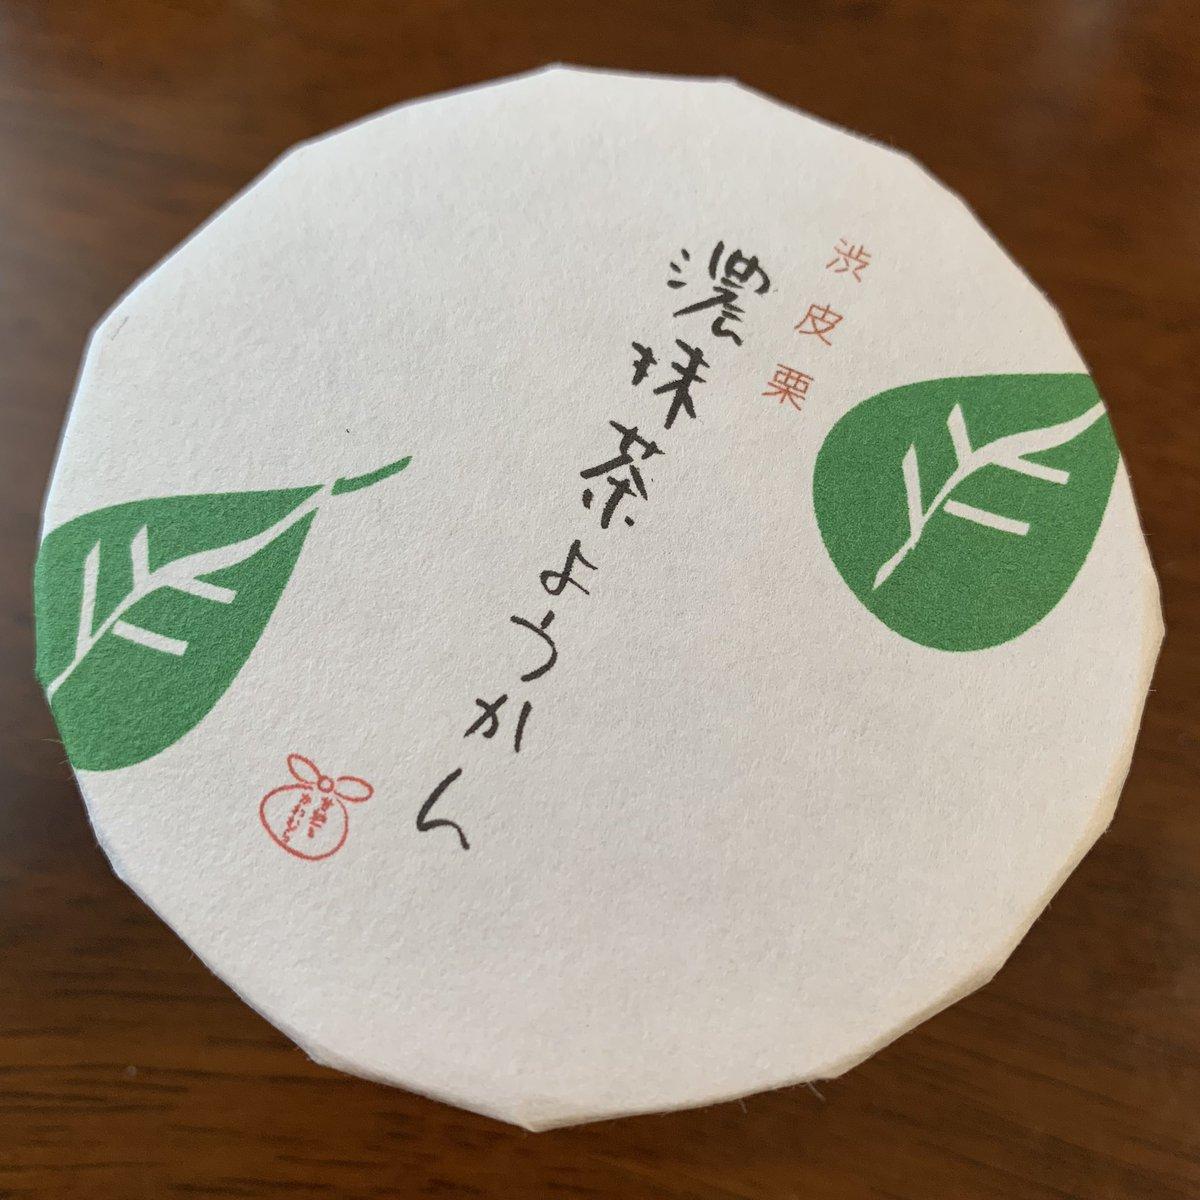 test ツイッターメディア - 甘納豆かわむらの渋皮栗濃抹茶ようかんで一服。程よい甘さで美味しい。 https://t.co/9XwDg8lvy6